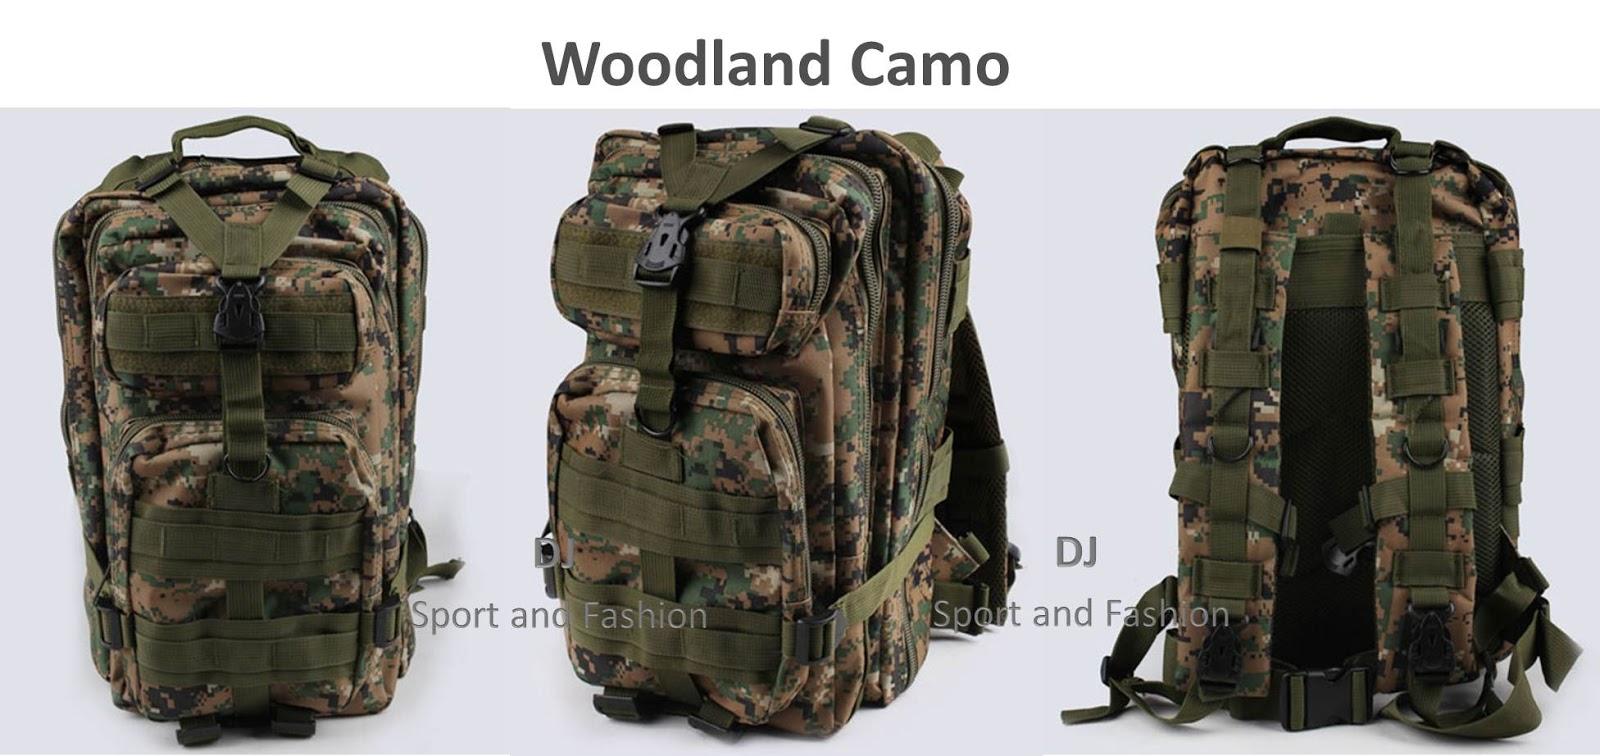 24l Army Bags - lelong%2B6_Amazing 24l Army Bags - lelong%2B6  Picture_647215.jpg